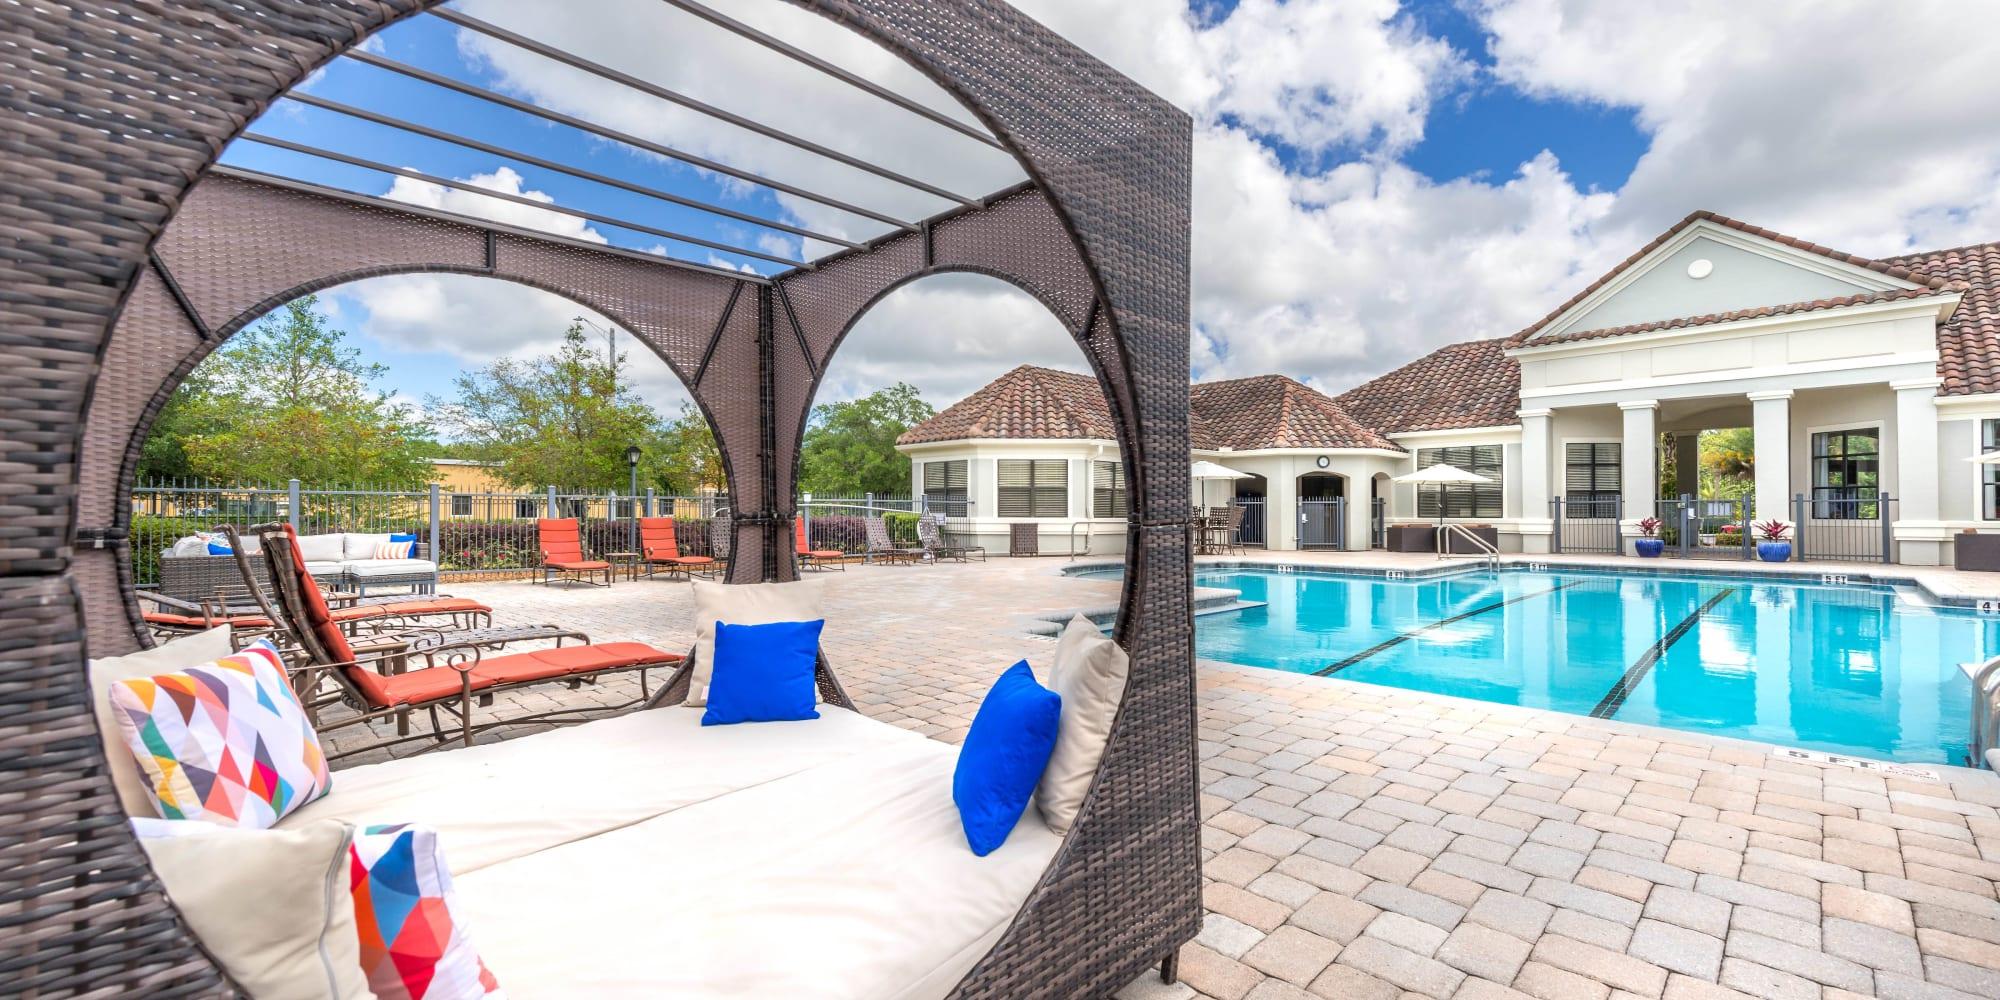 Apartments at Mirador & Stovall at River City in Jacksonville, Florida